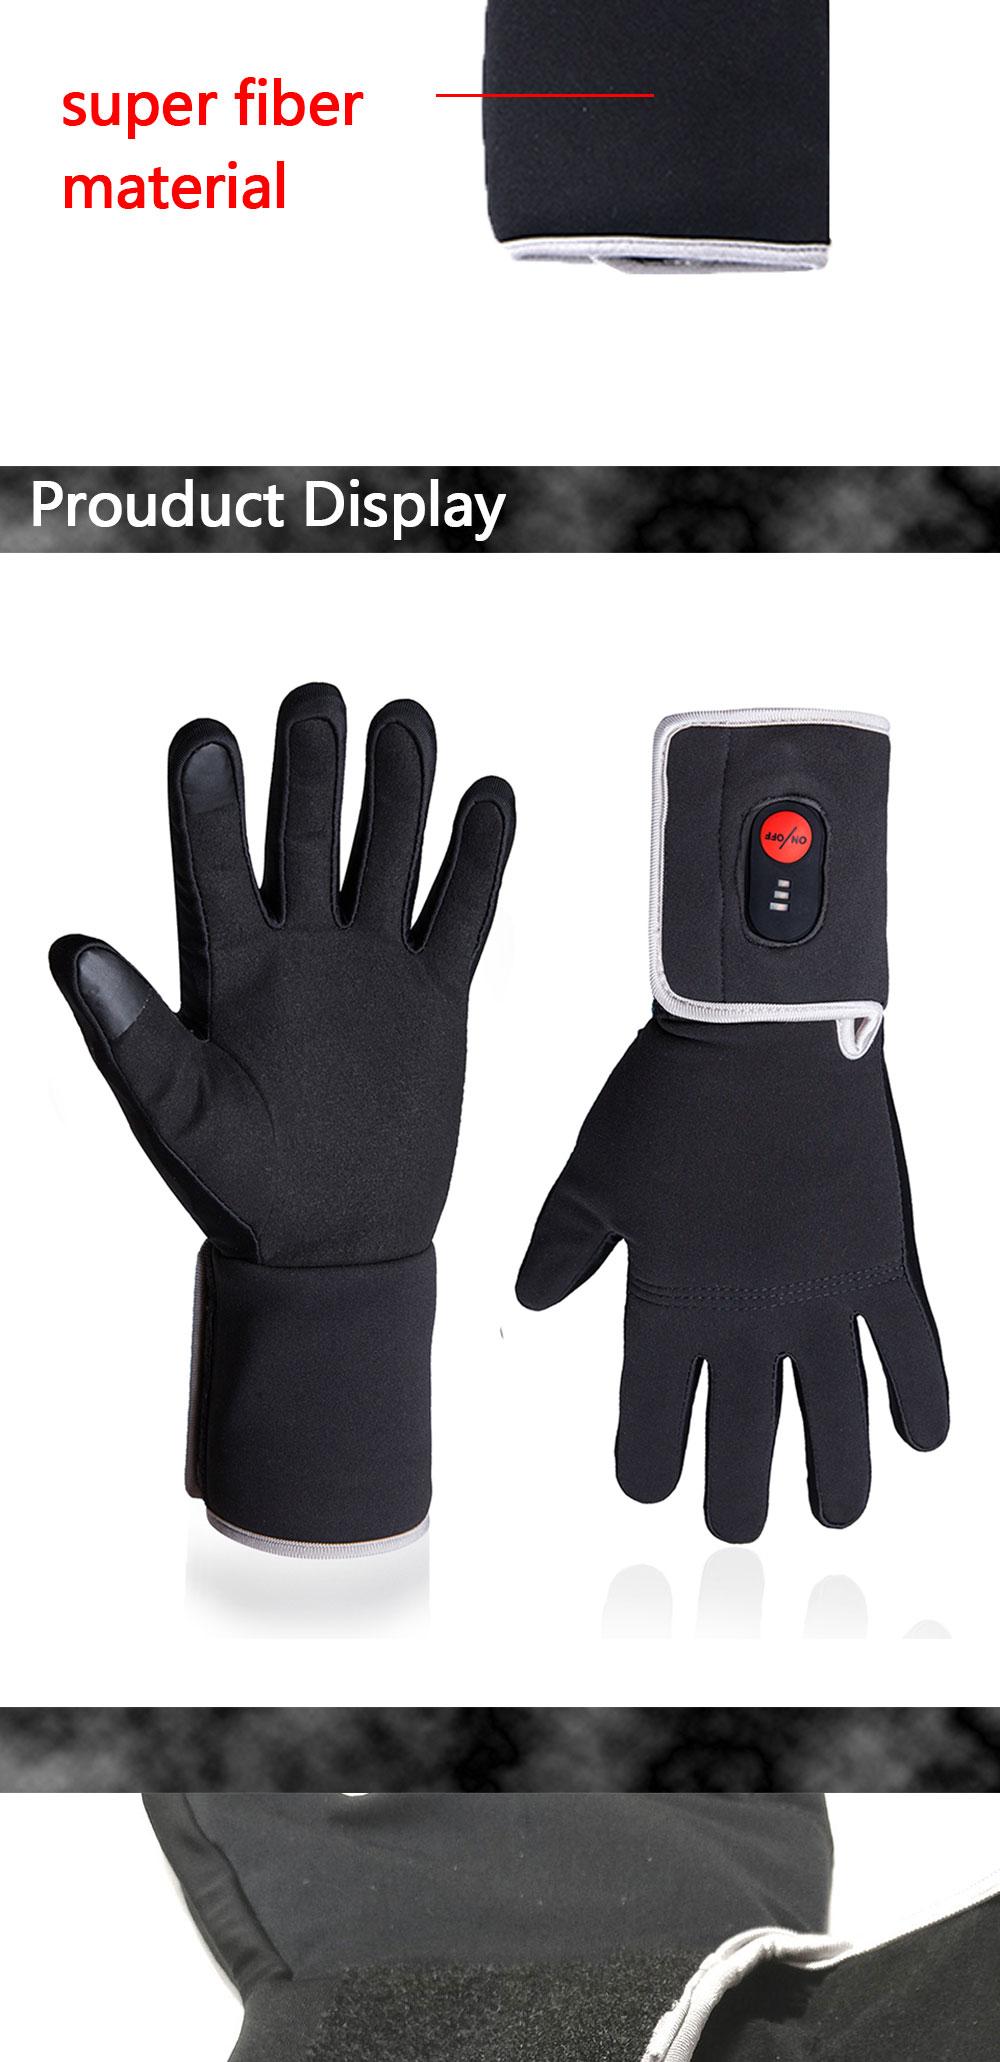 WNGH2 Heated Gloves_10